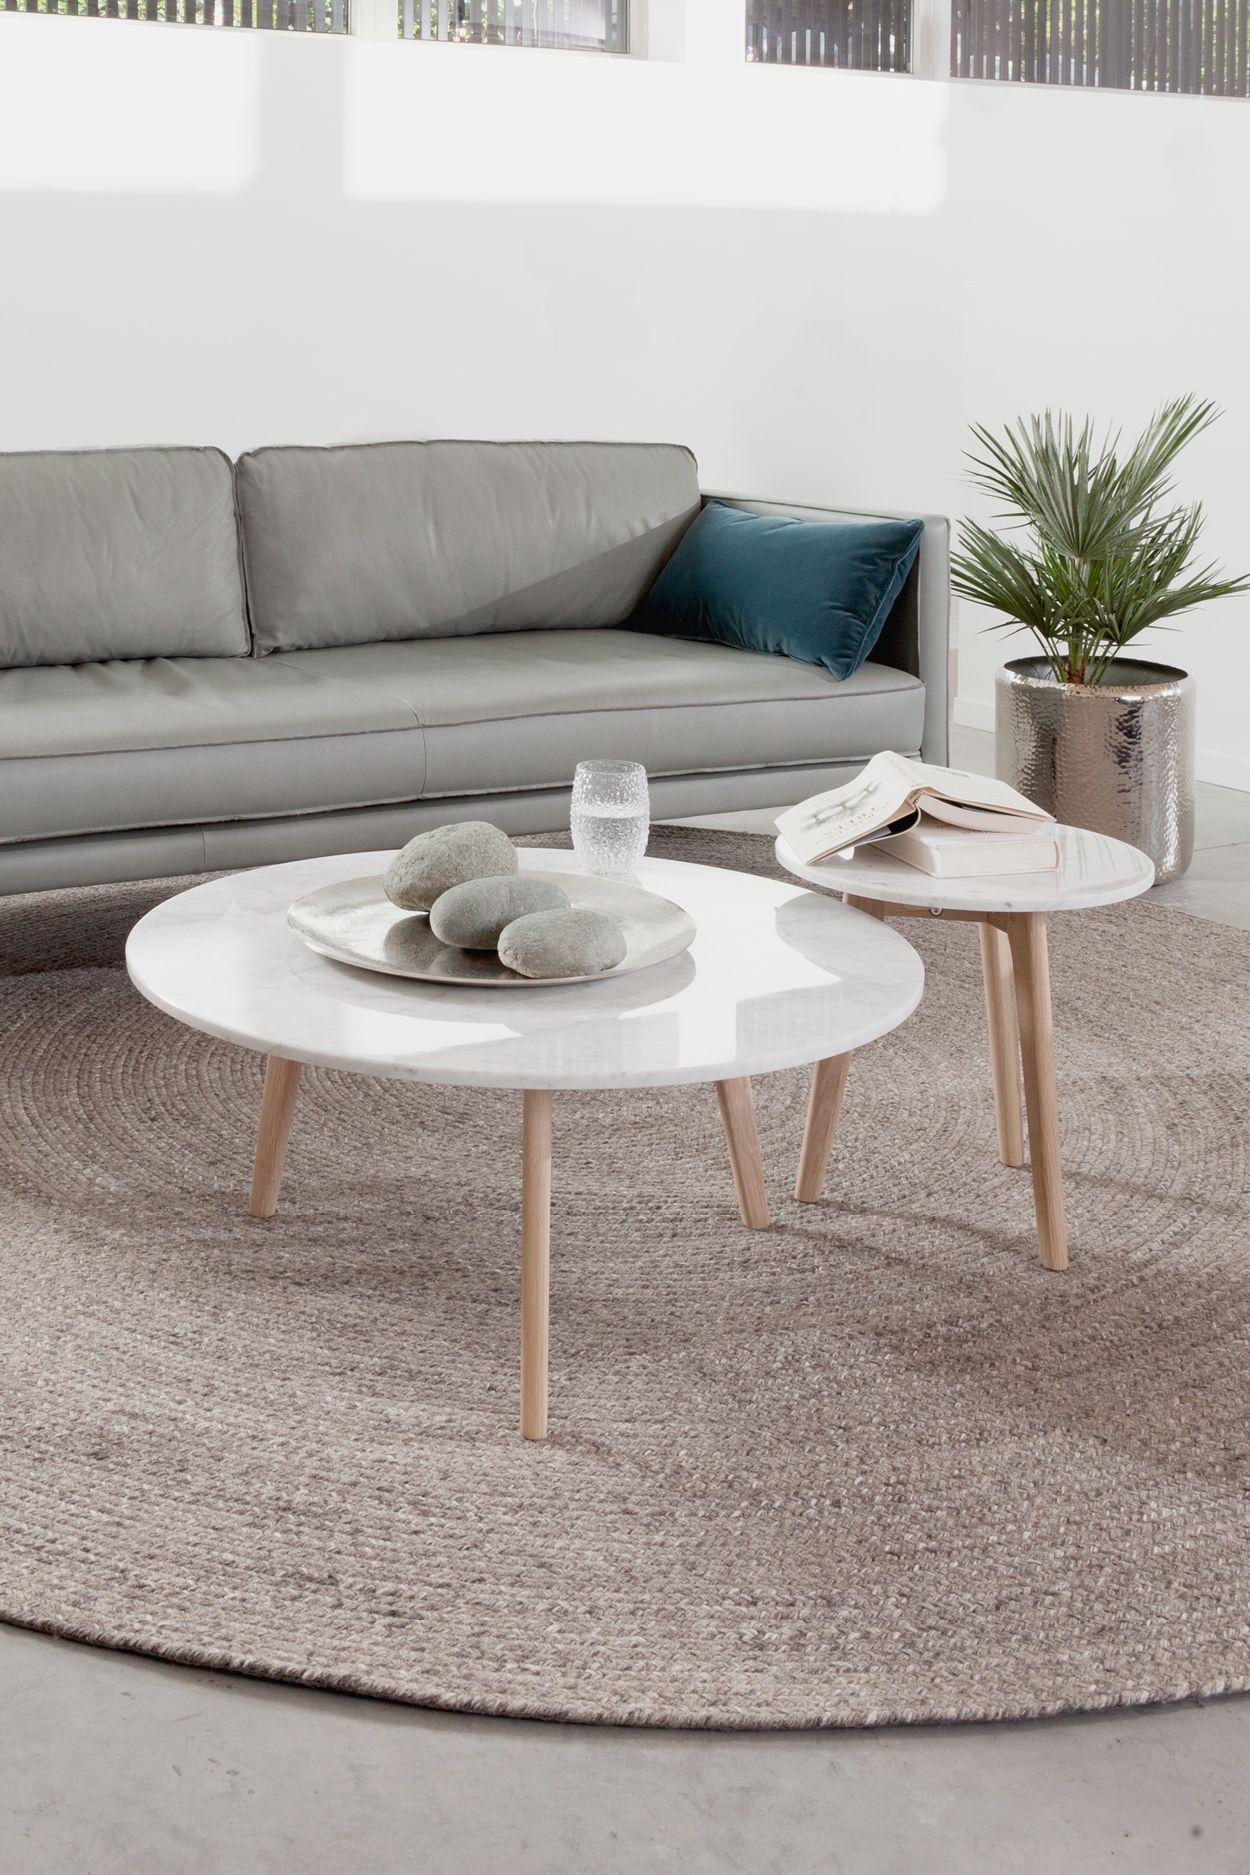 nesting table, white marble top, grey rattan rug, grey sofa, seamless floor